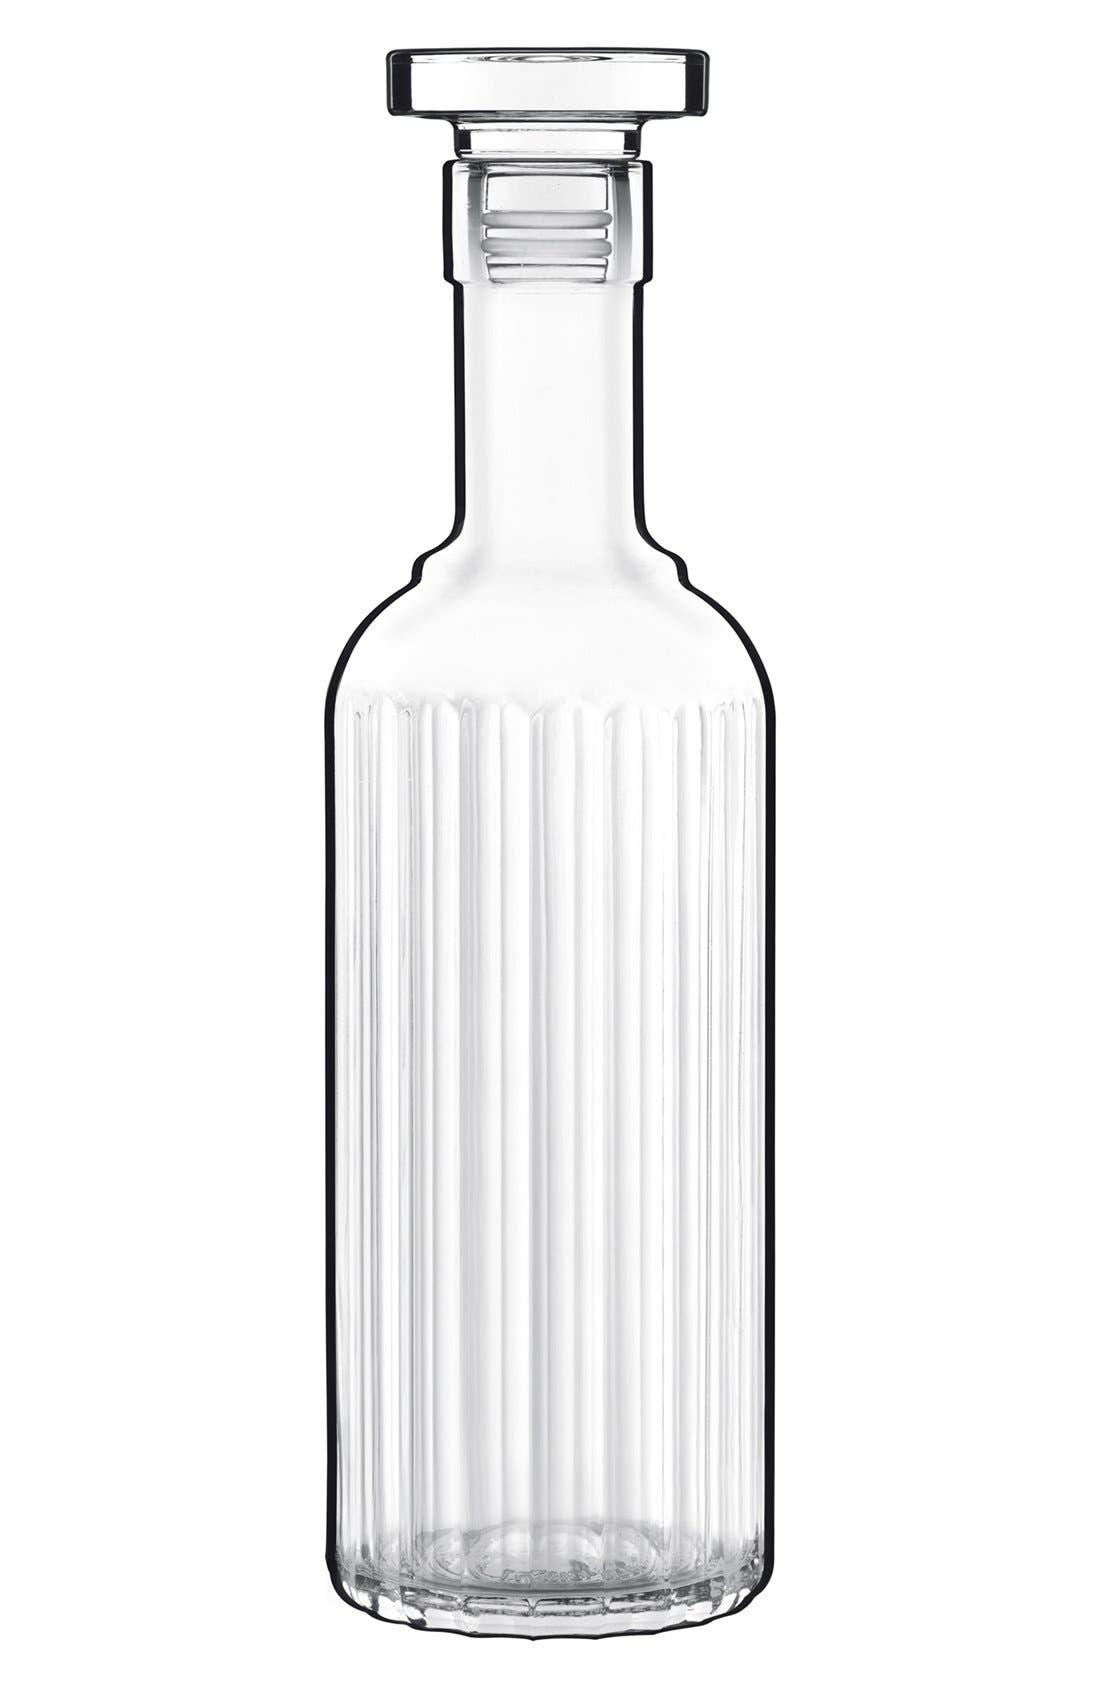 'Bach' Spirits Bottle,                             Main thumbnail 1, color,                             100